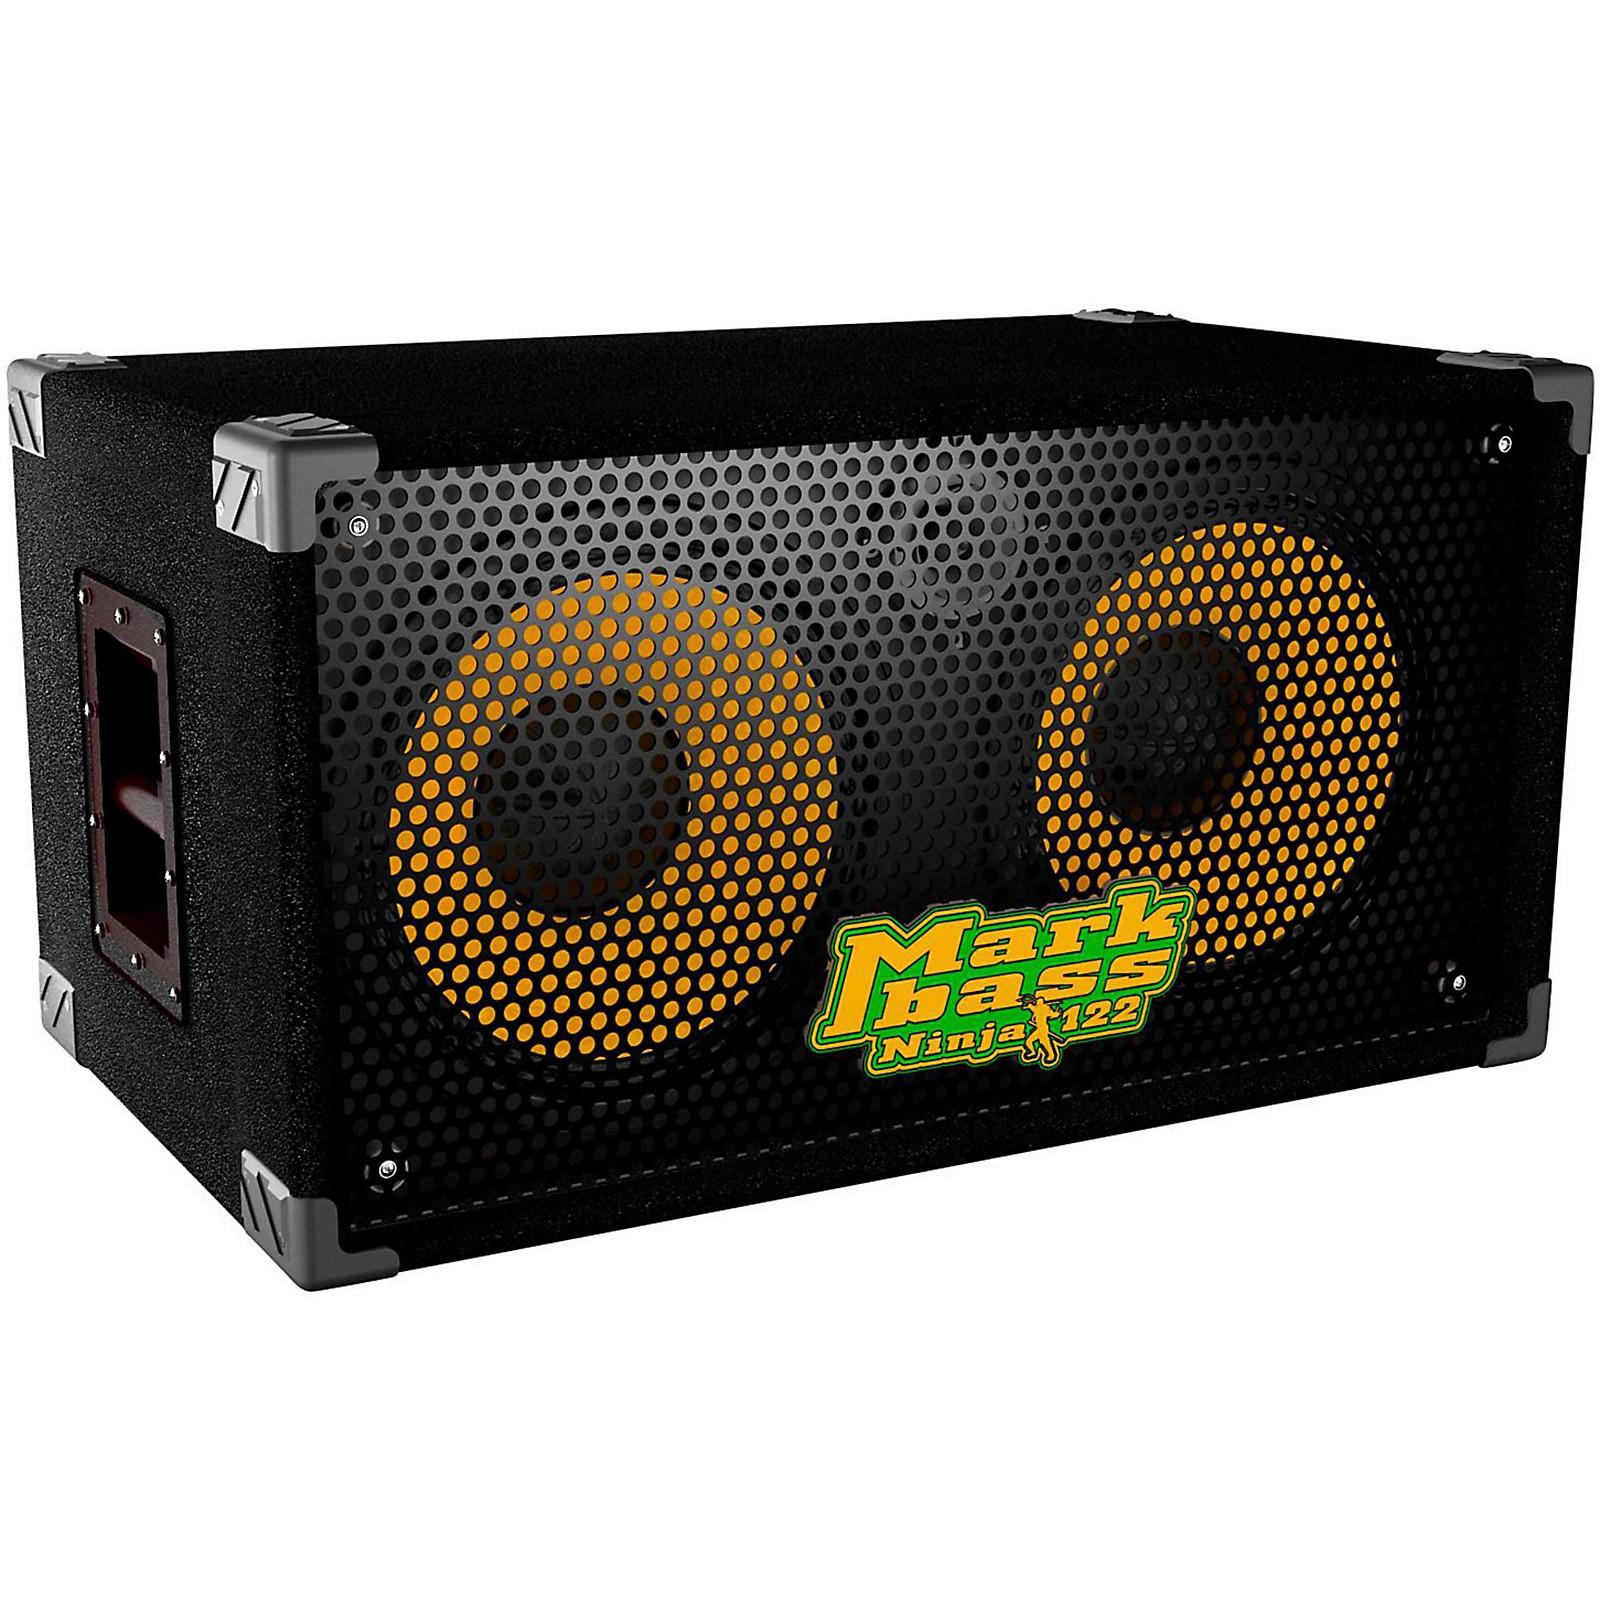 Markbass New York 122 Ninja 2x12 Richard Bona Signature Bass Speaker Cabinet